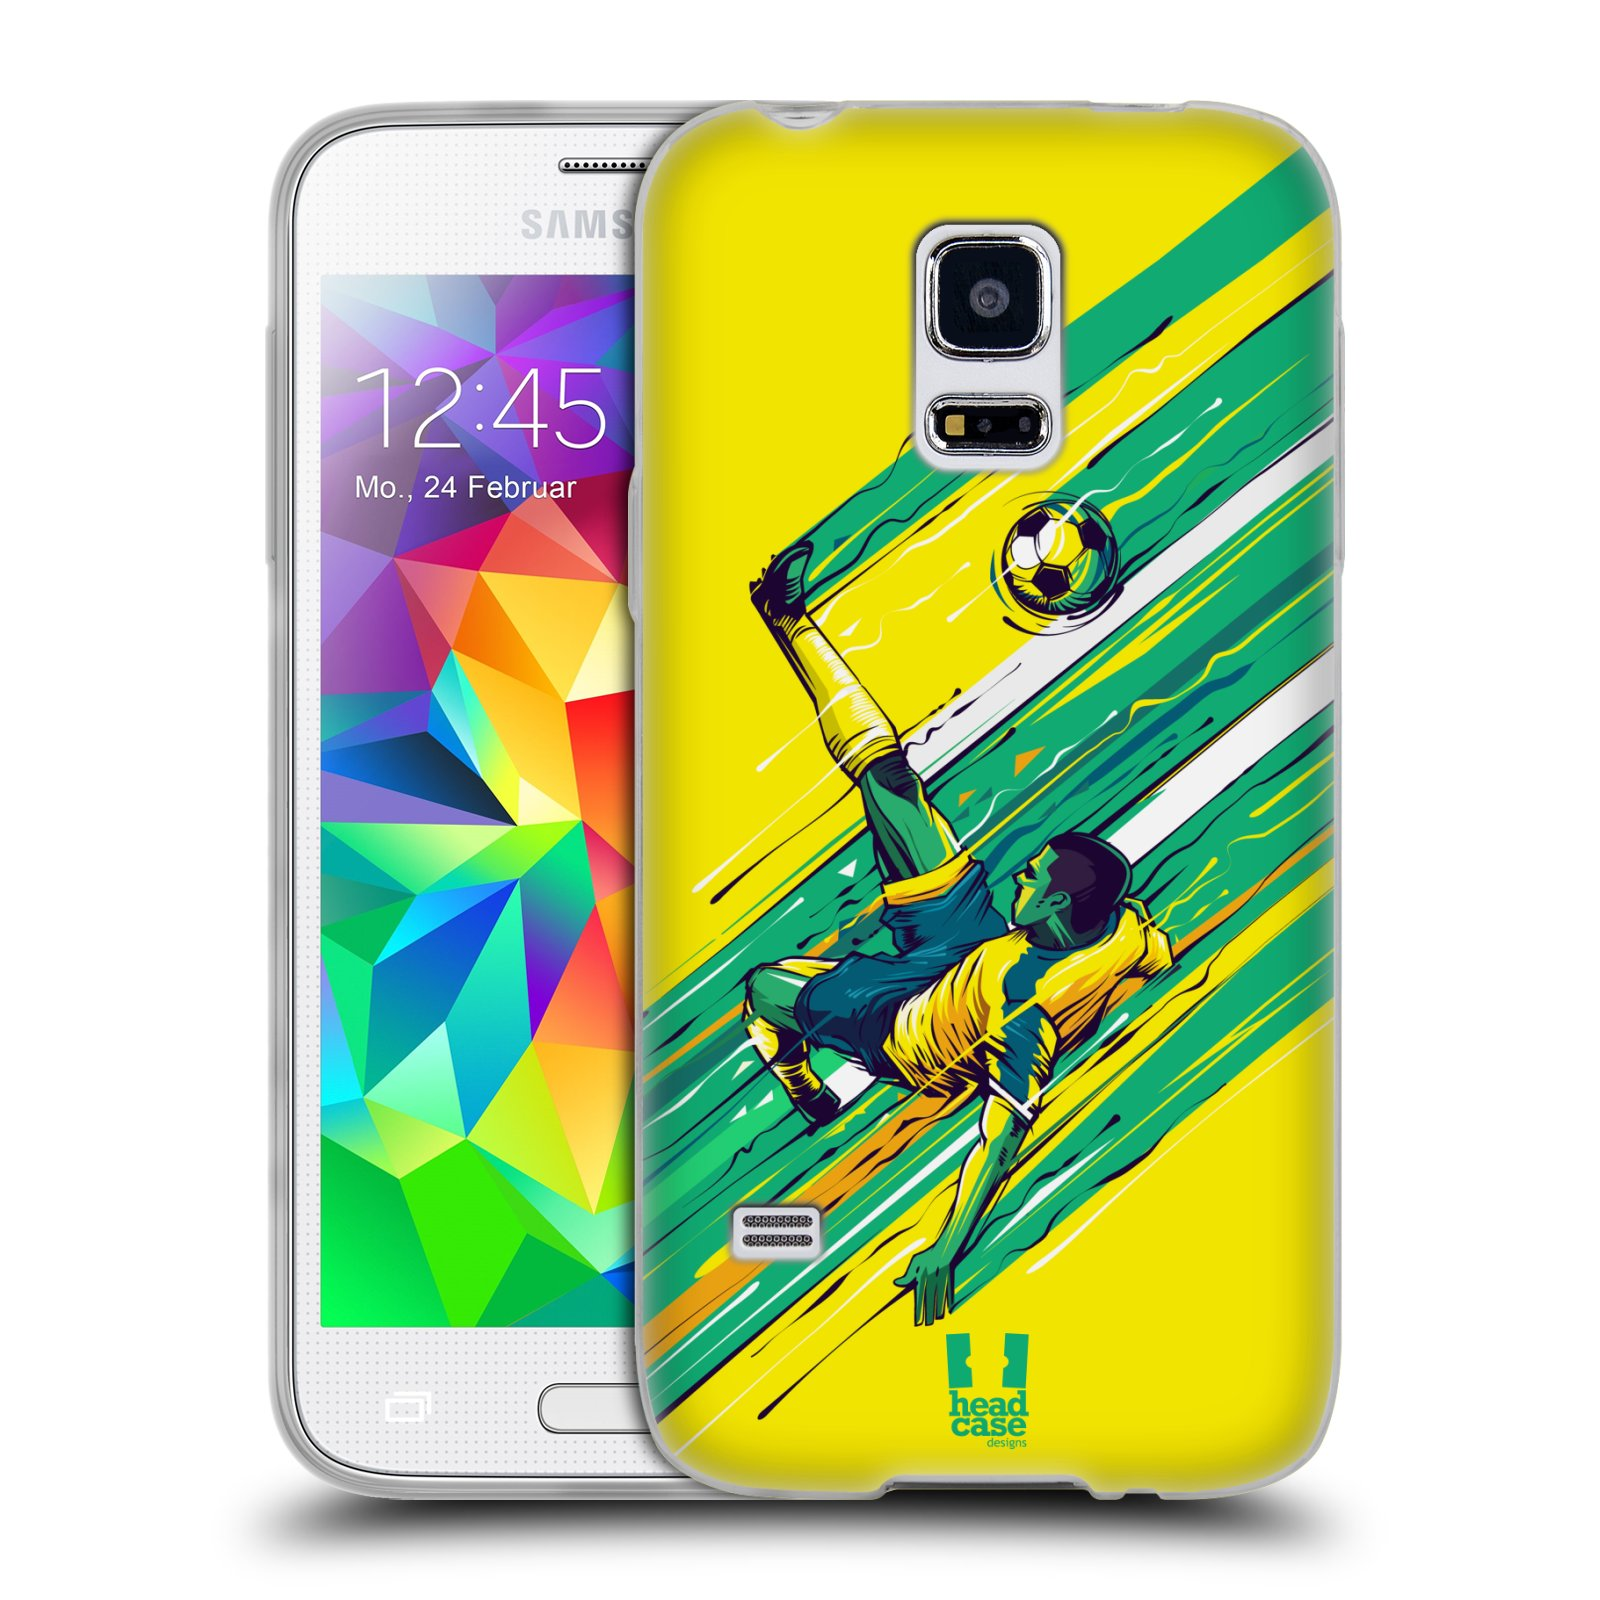 HEAD CASE silikonový obal na mobil Samsung Galaxy S5 MINI Sport fotbal kreslený nůžky